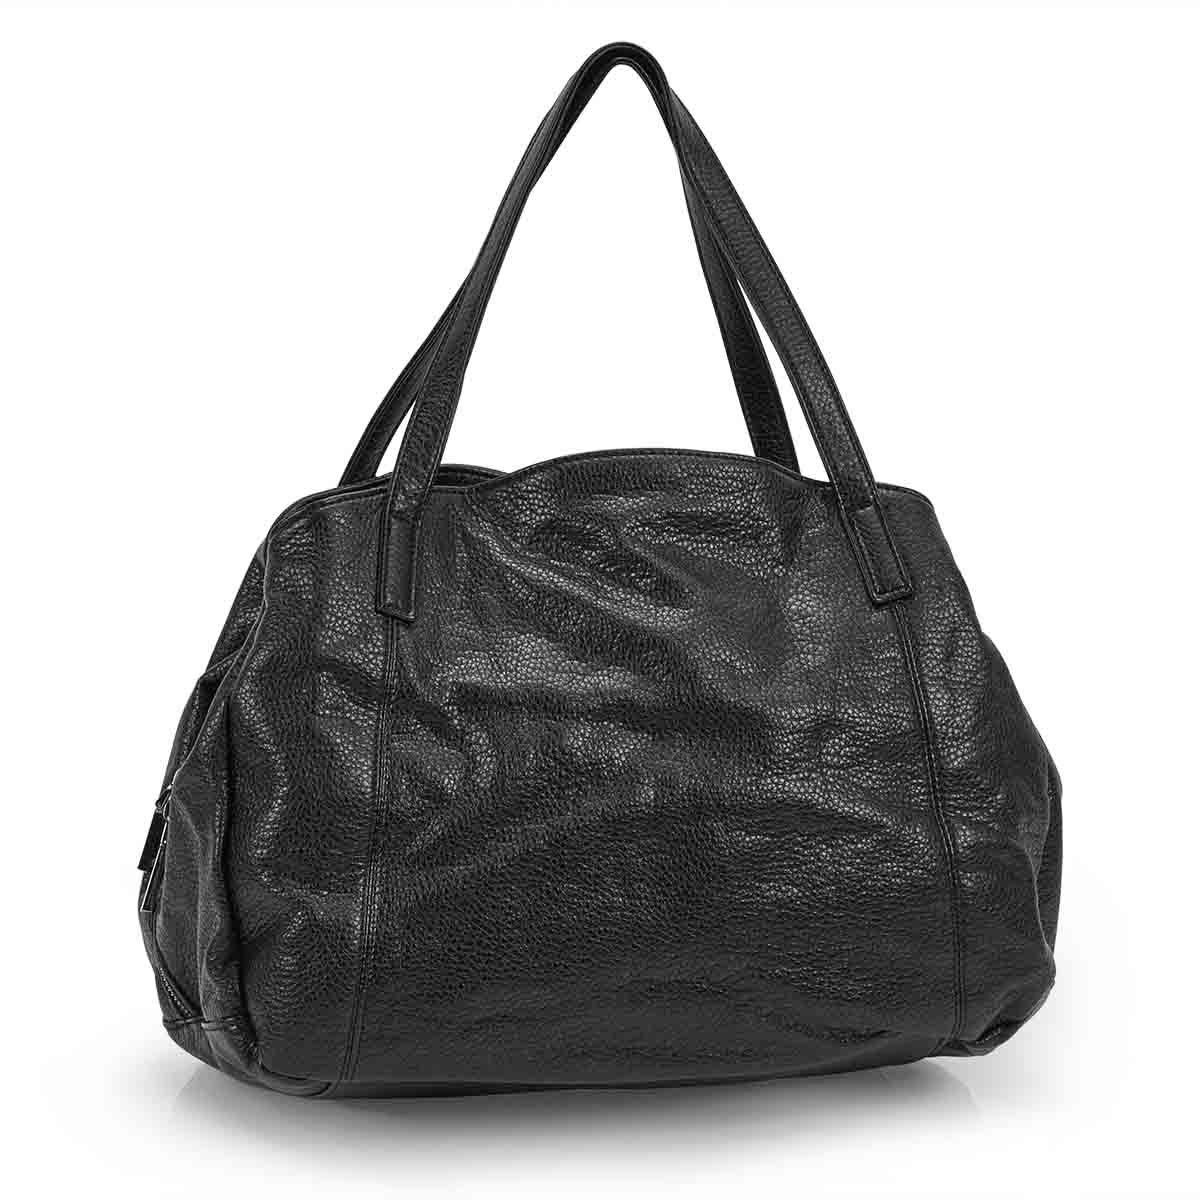 Women's MADISON black tote bag